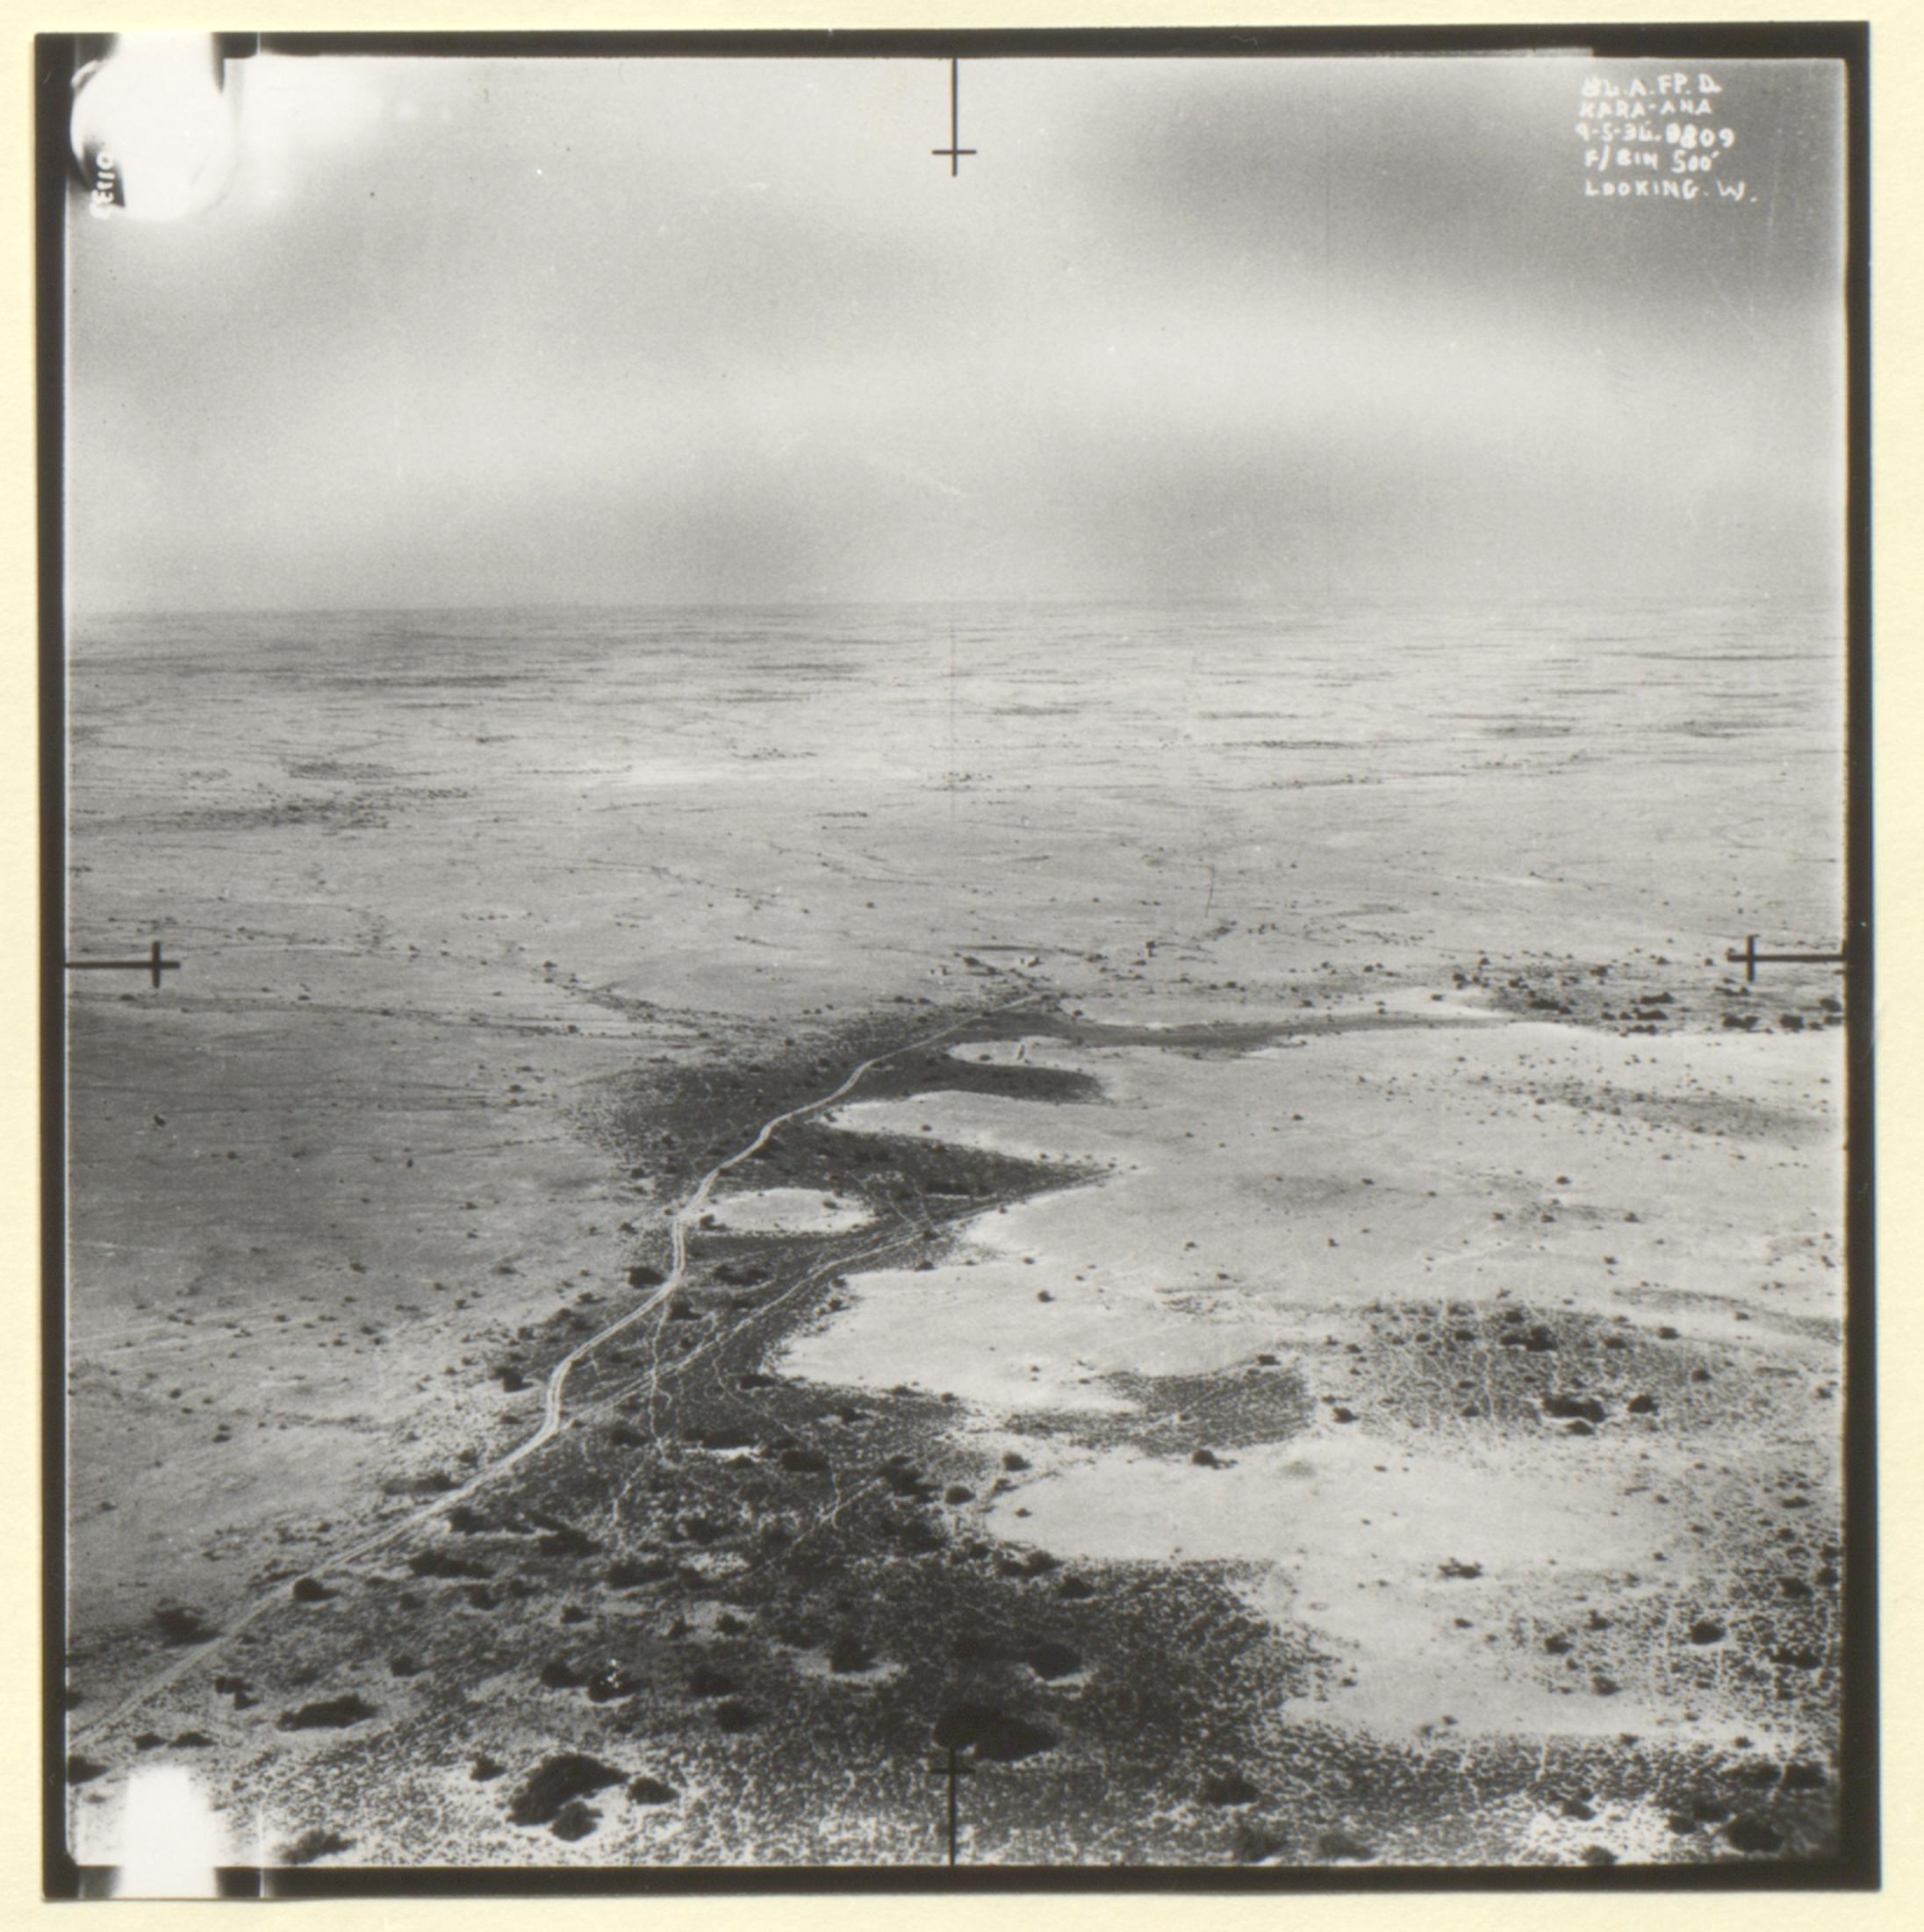 7th Royal Air Force photograph of Doha, Kara-Ana and Raiyan from a the file 'Air-route to India: Arab coast route; emergency landing ground at Qatar' (1934) (IOR/L/PS/12/1956)